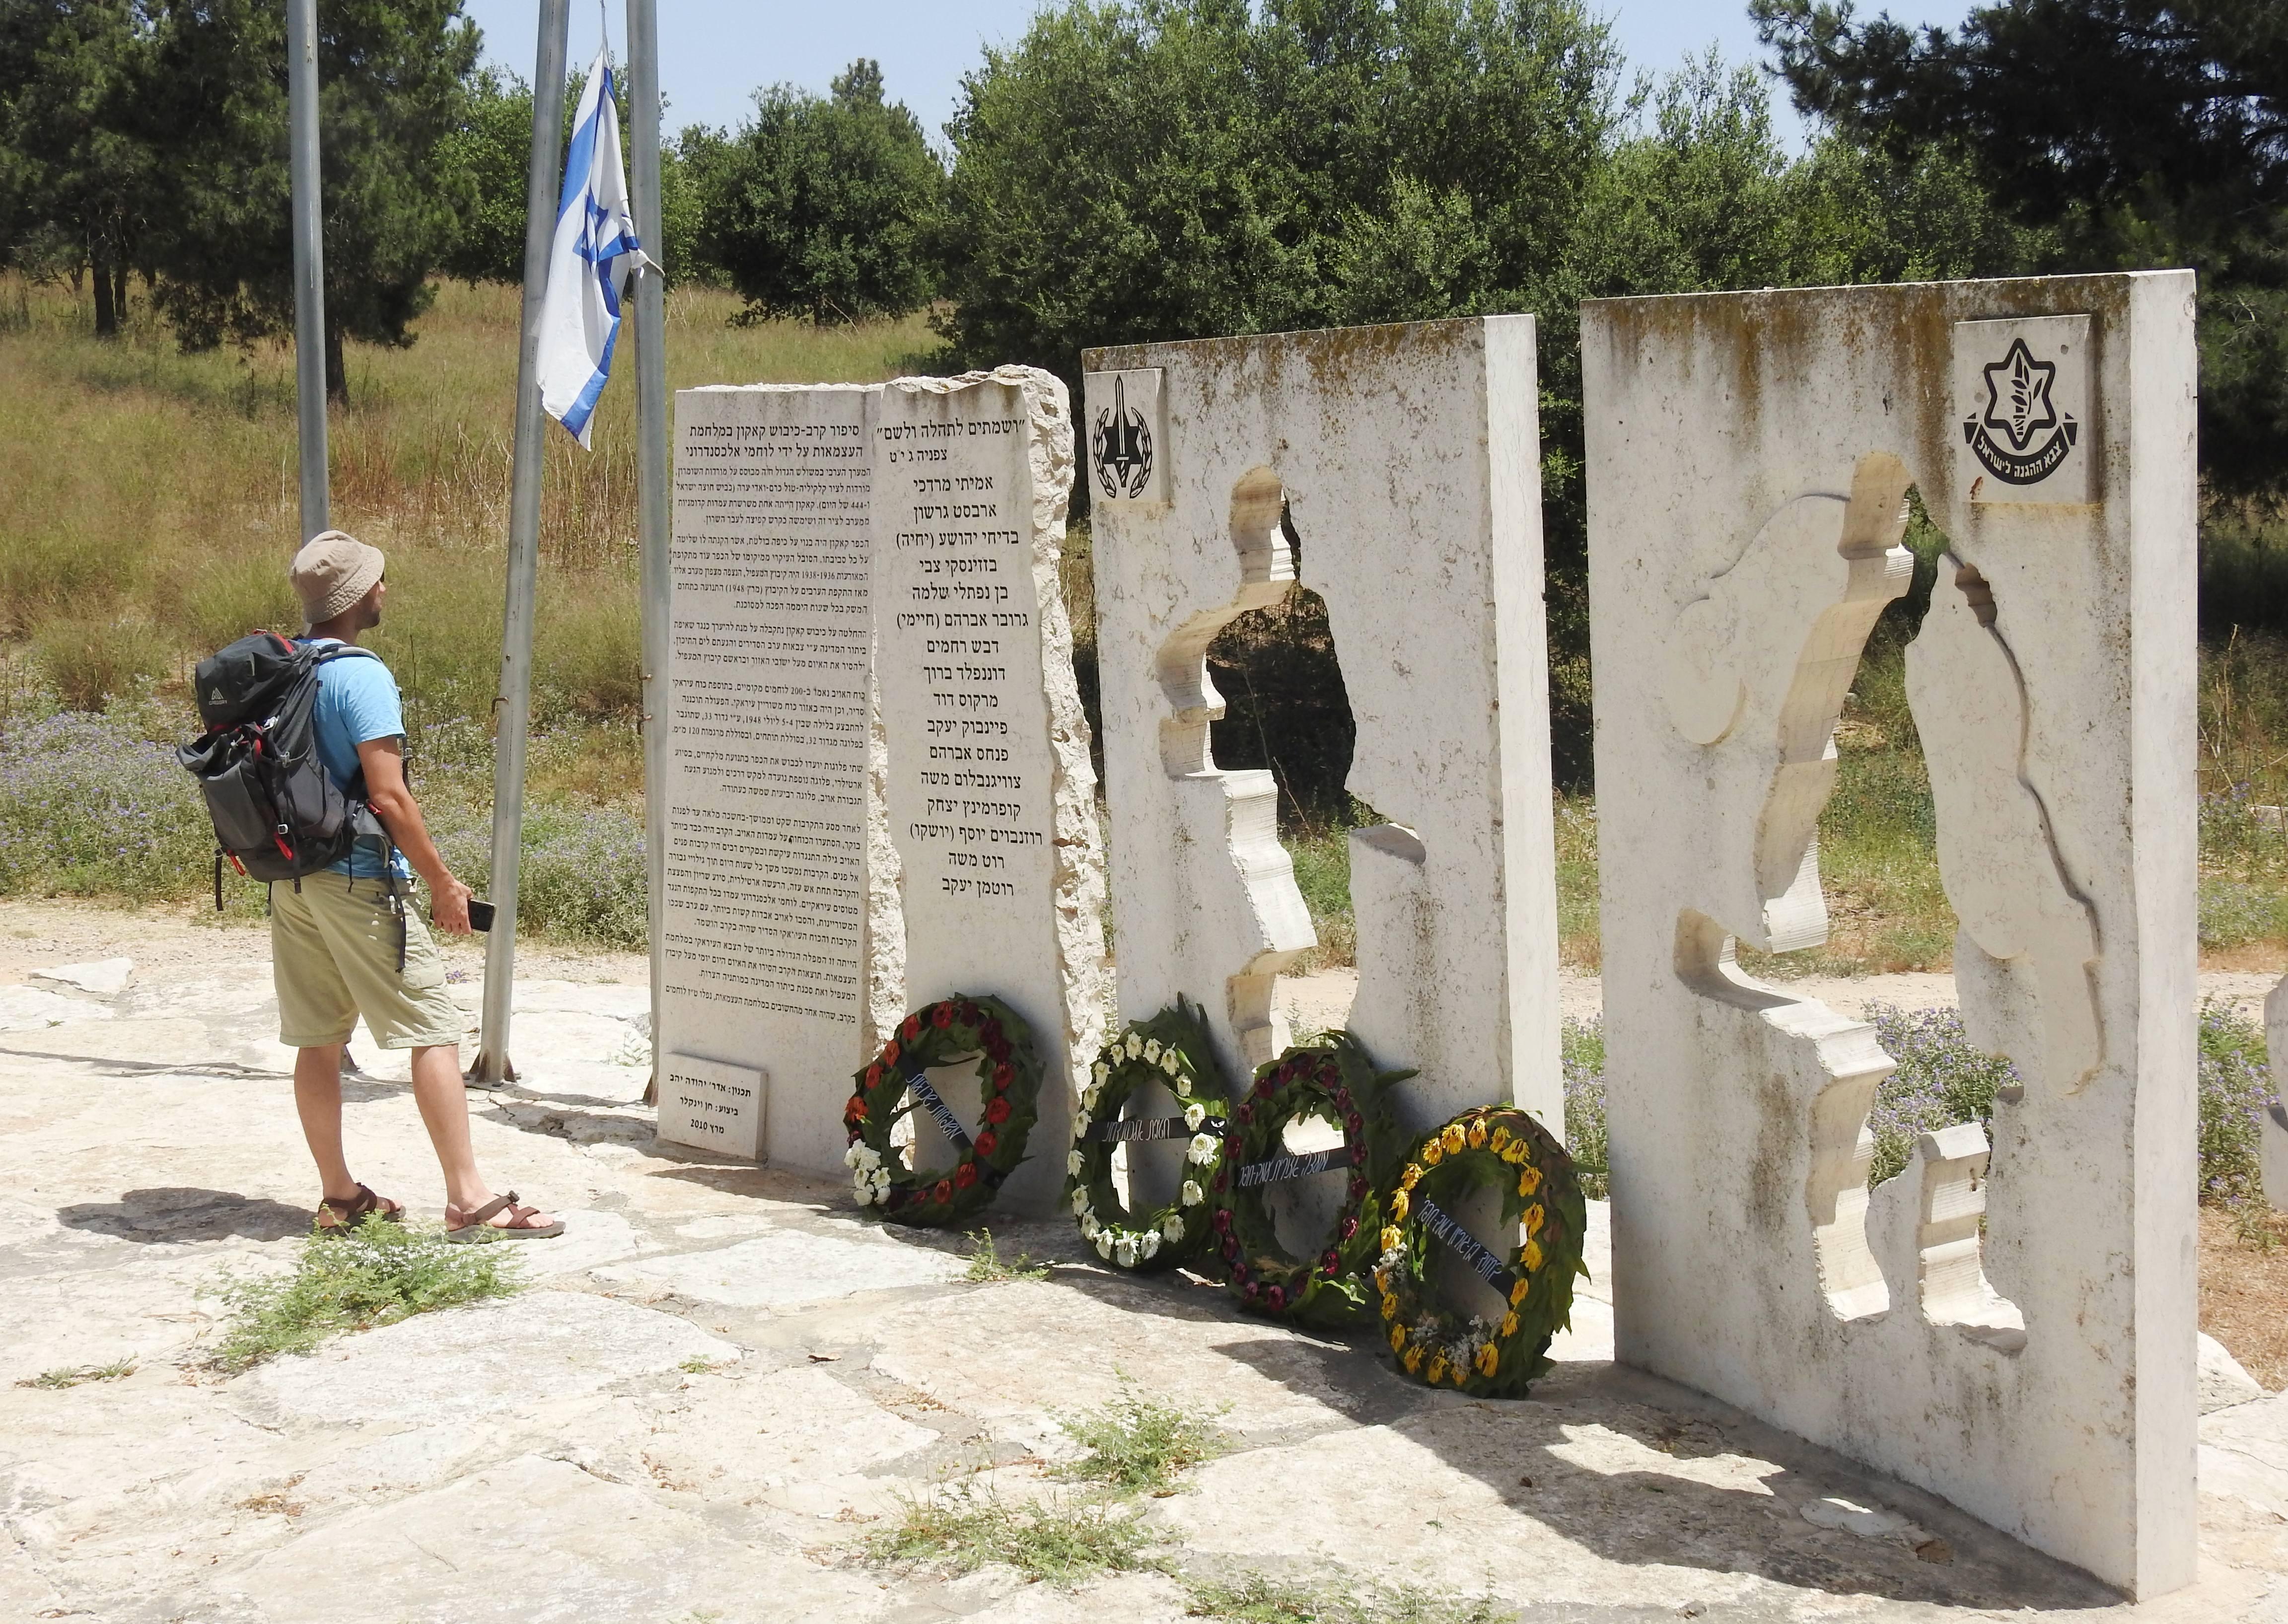 The Battle for Qaqun monument